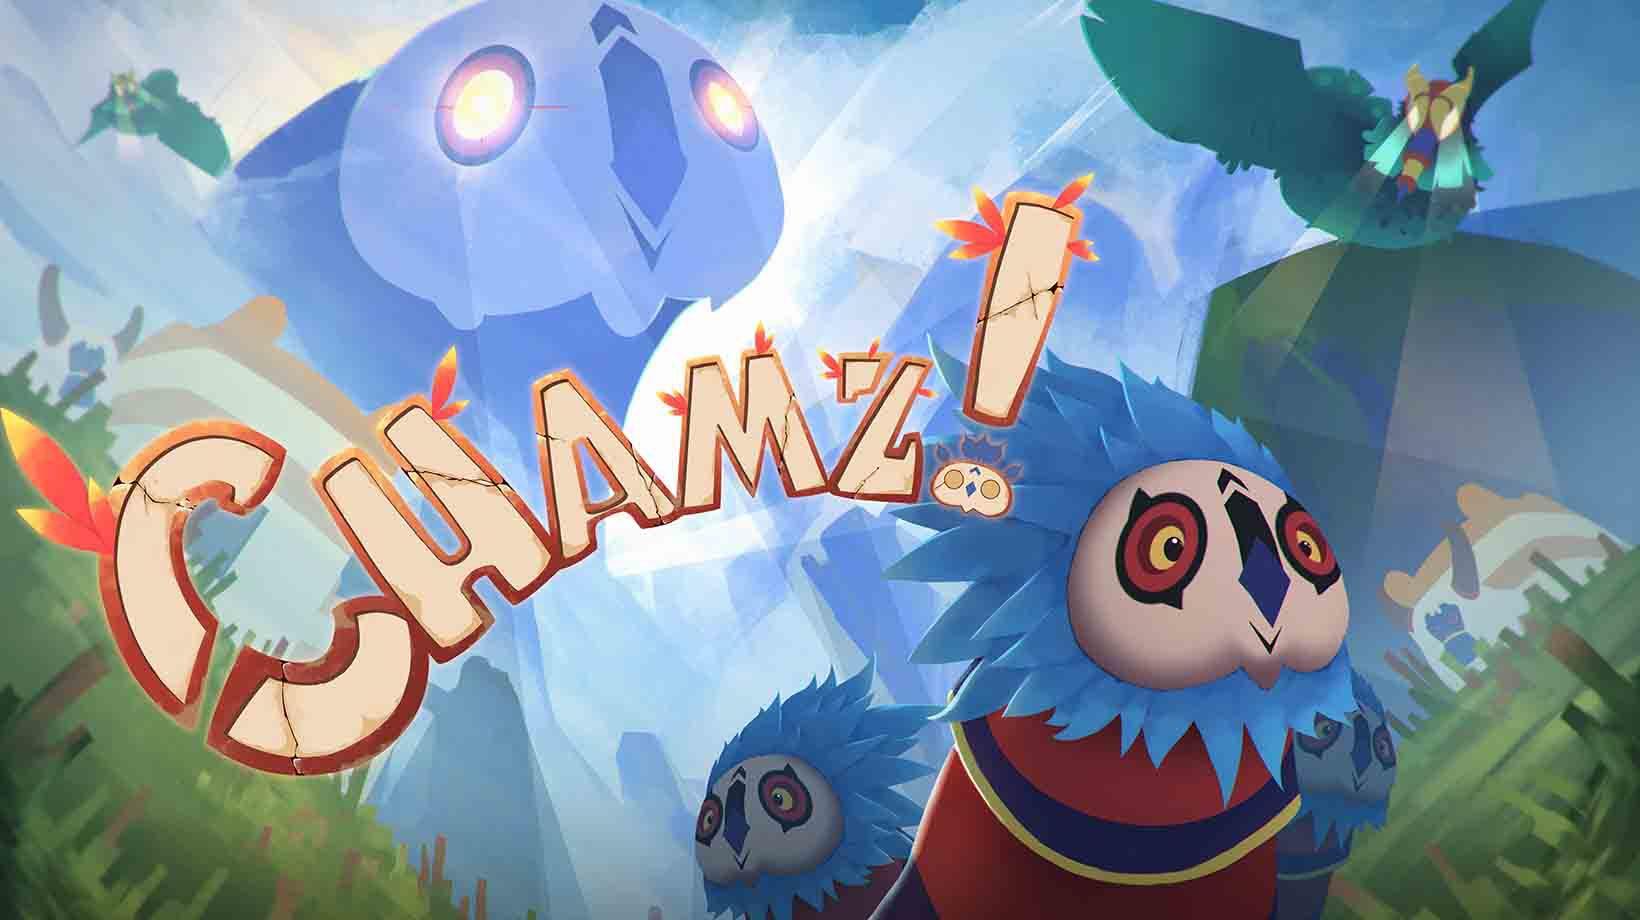 chamz